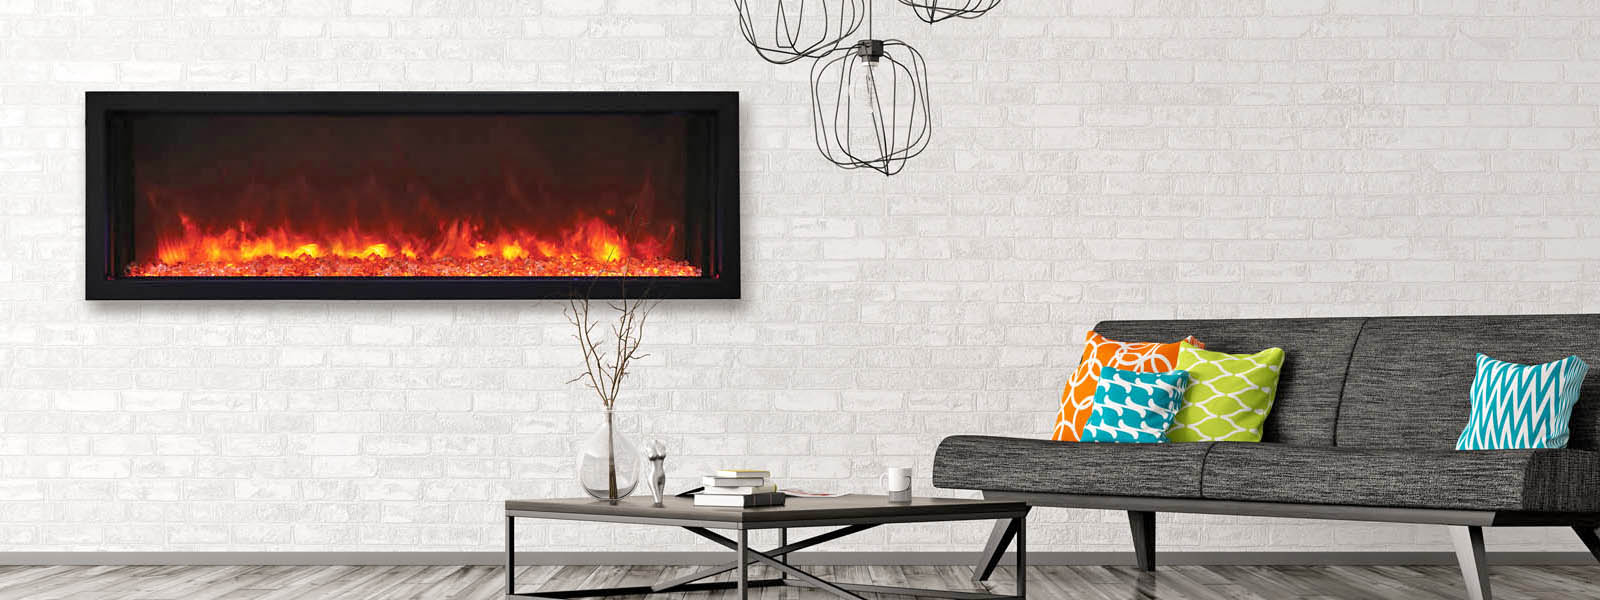 Amantii extra slim electric fireplace